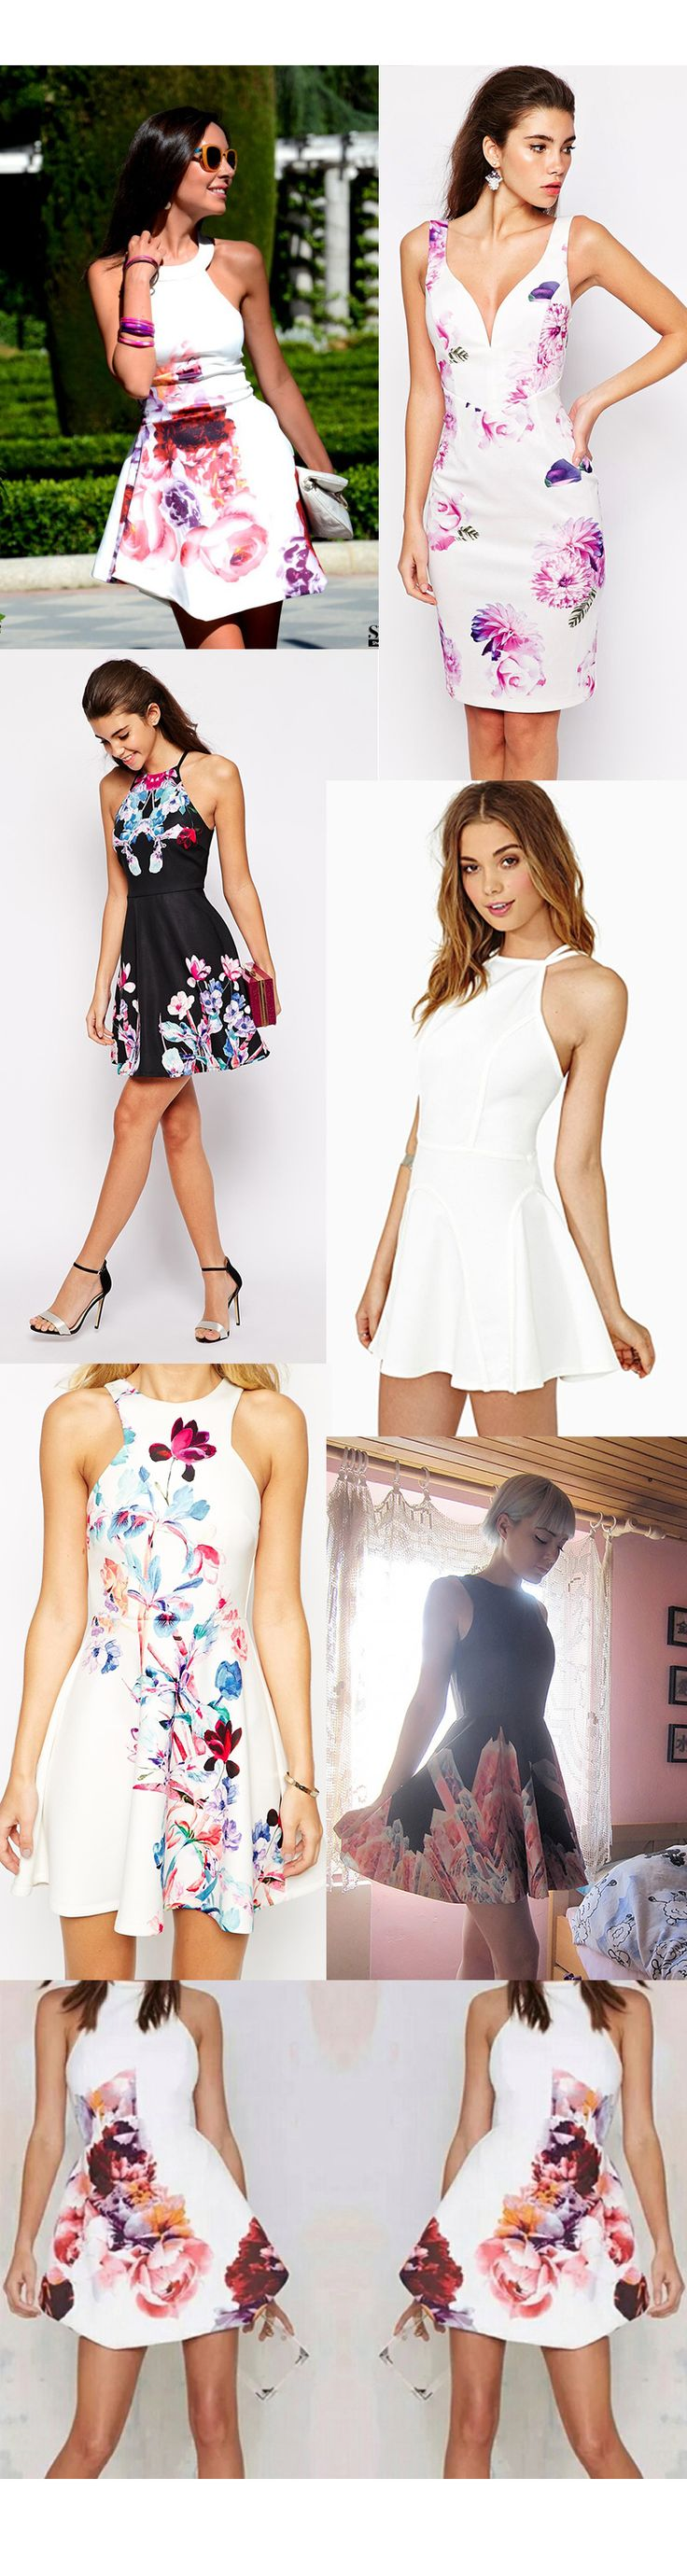 Cute & Stylish Women Floral Print Dresses